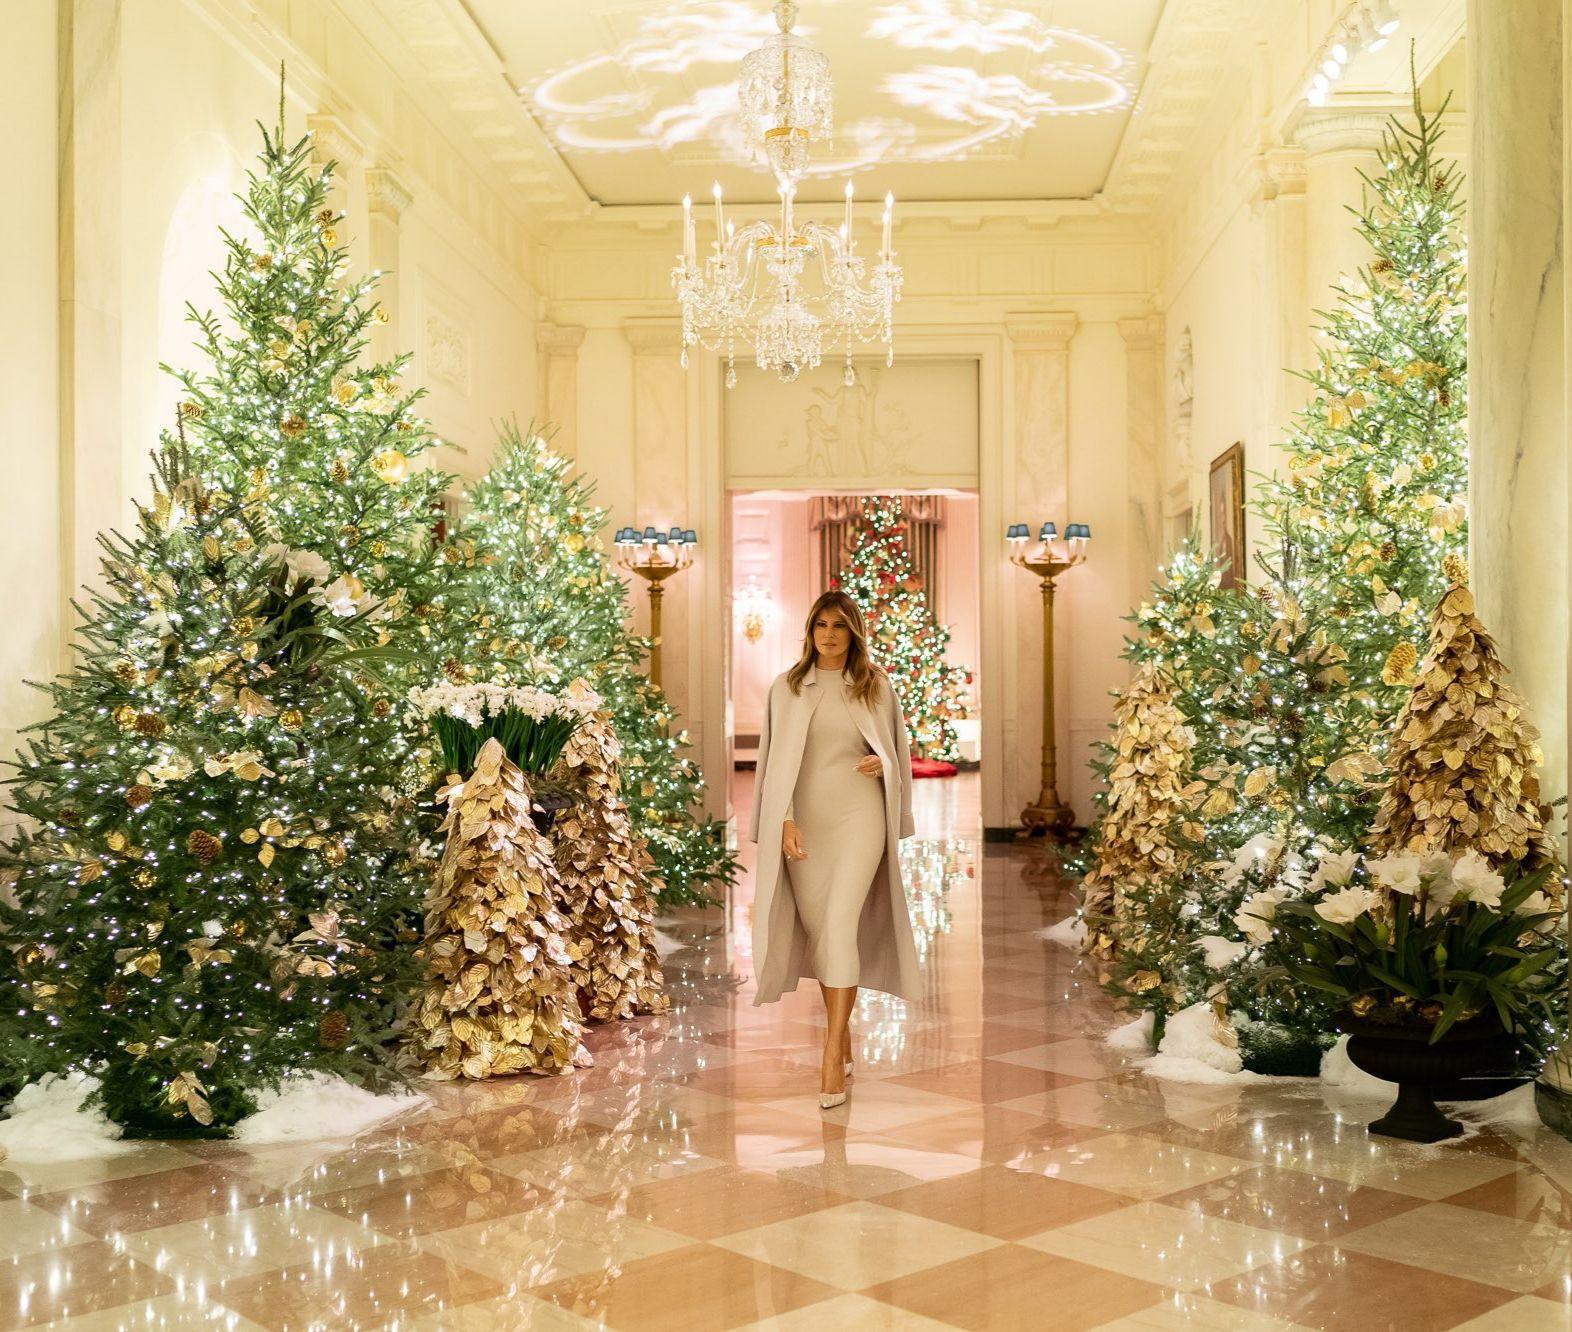 Flotus Melania Trump Shows Off The White House Christmas Decorations On Dece White House Christmas Decorations White House Christmas White House Christmas Tree